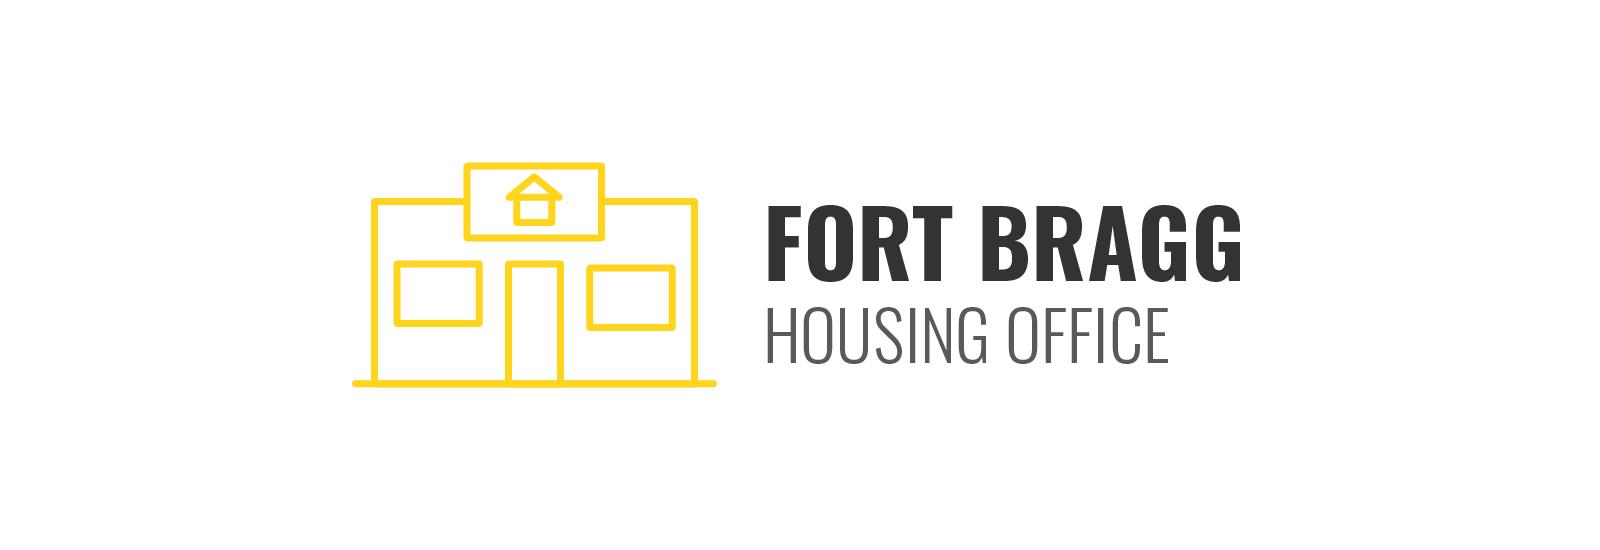 Fort Bragg Housing Office